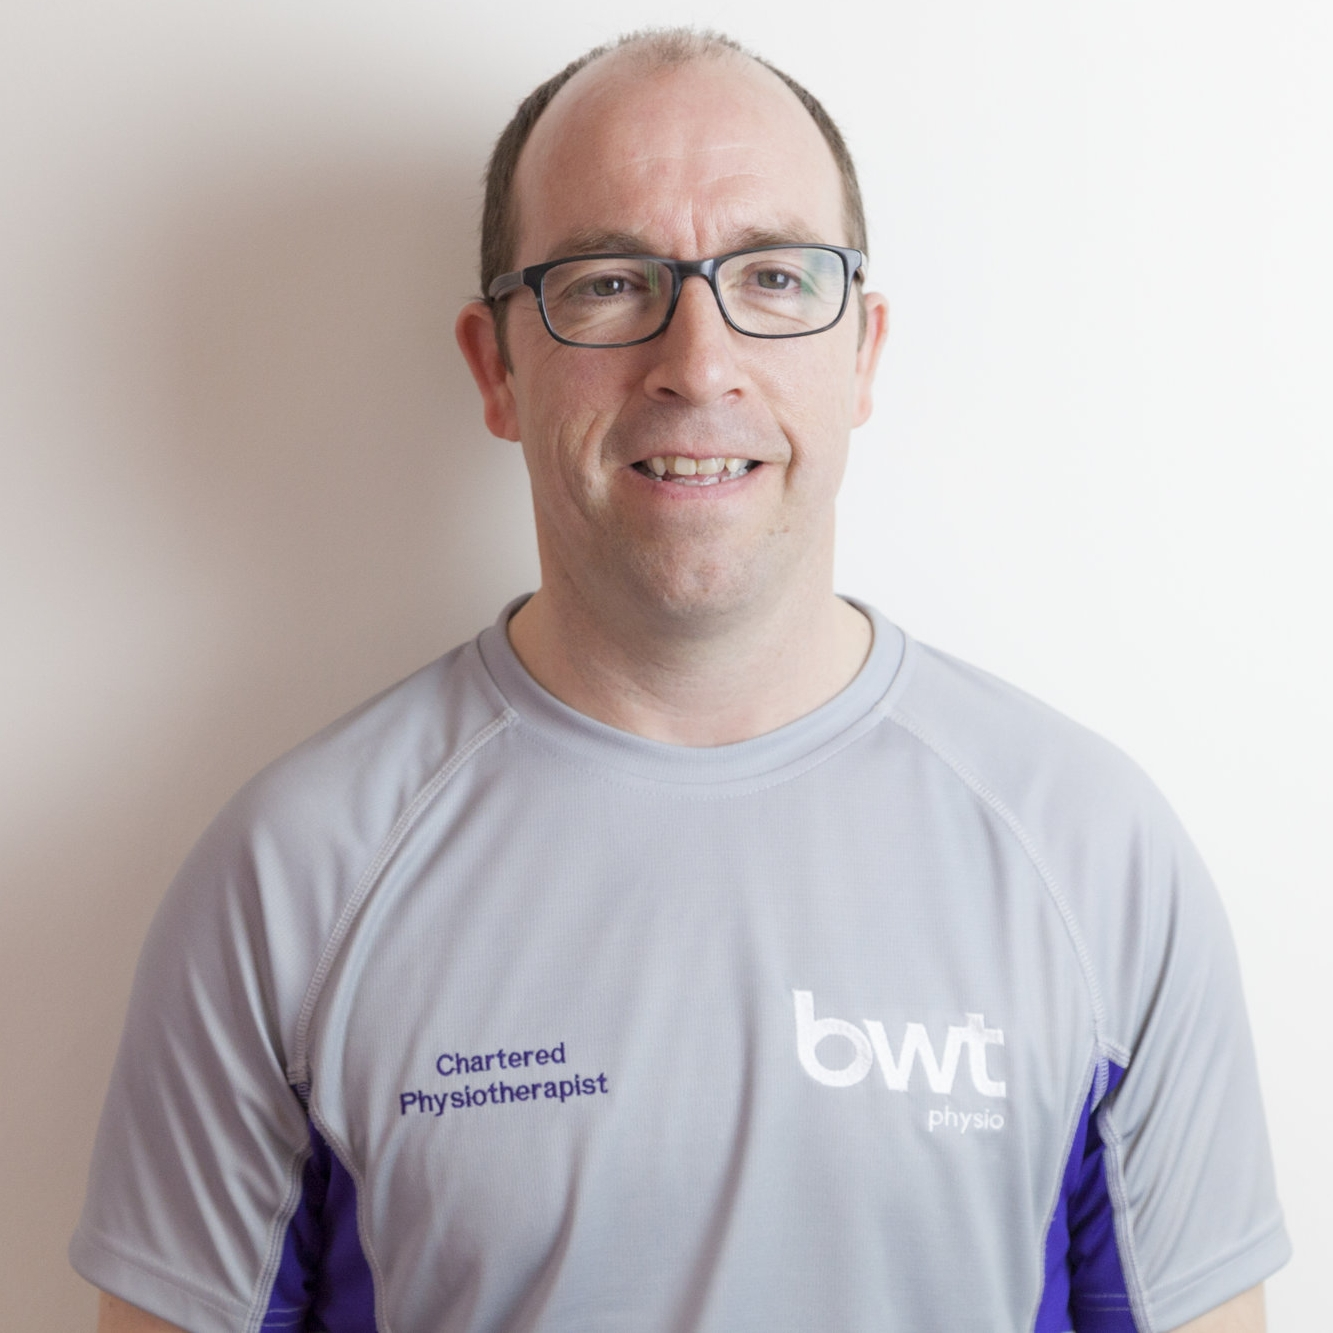 Matt O'Neill   Chartered Physiotherapist